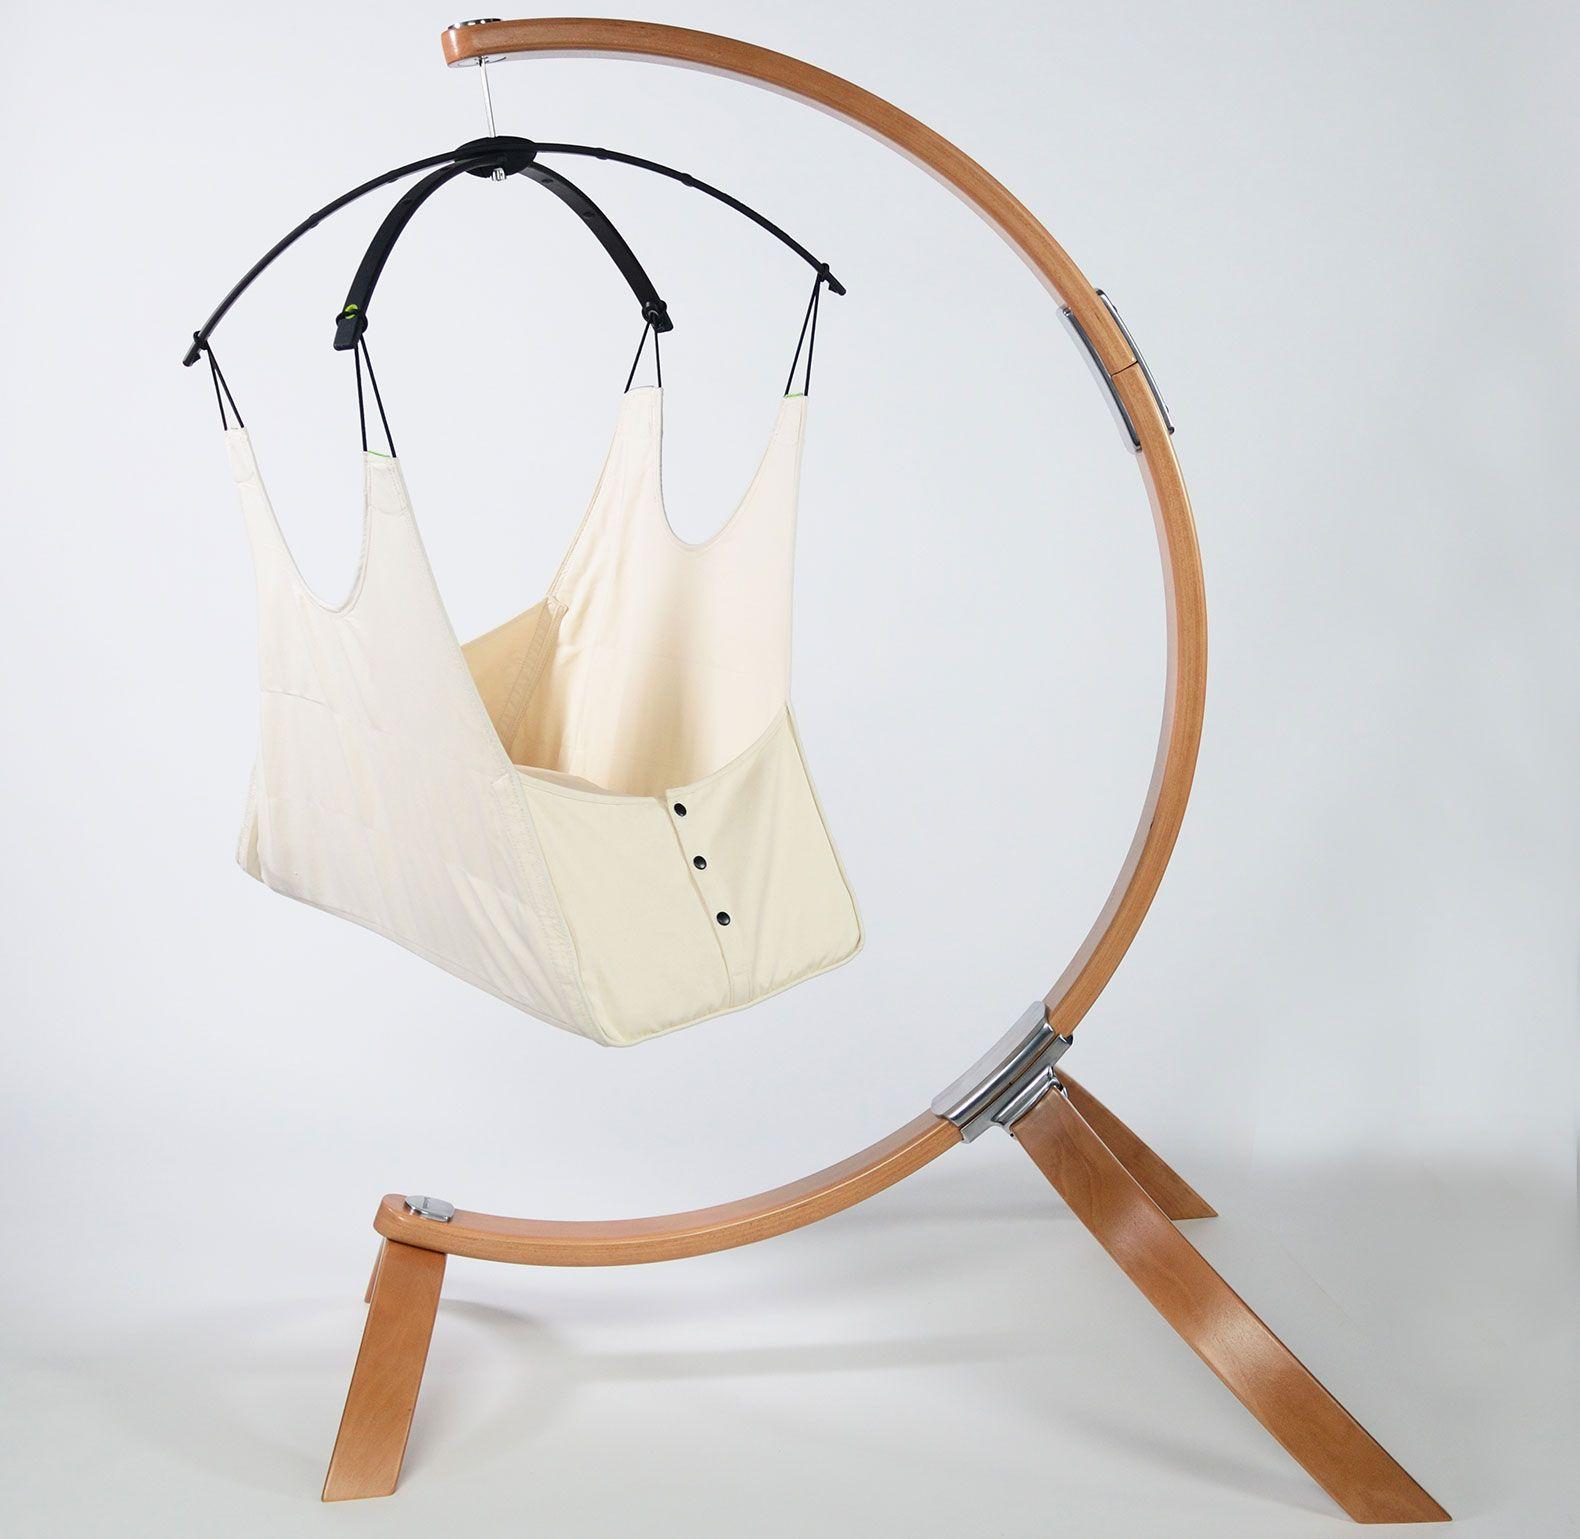 in love with this eco friendly baby rocker hushamok okoa hammock giveaway  win a free hushamok organic baby hammock worth  599      rh   pinterest